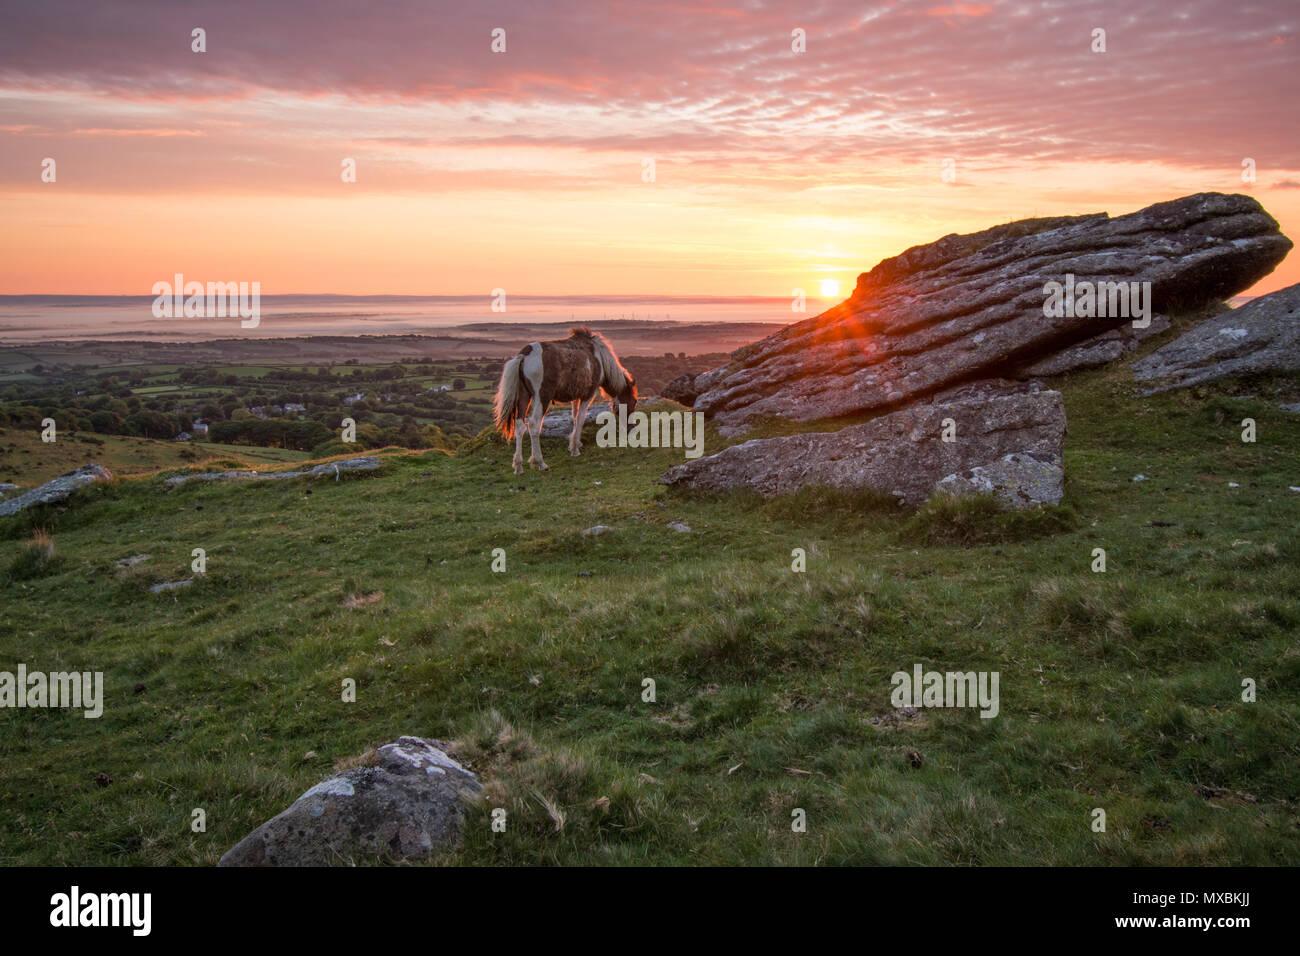 A beautiful Sunday morning June sunrise over the village of Belstone on Dartmoor - Stock Image